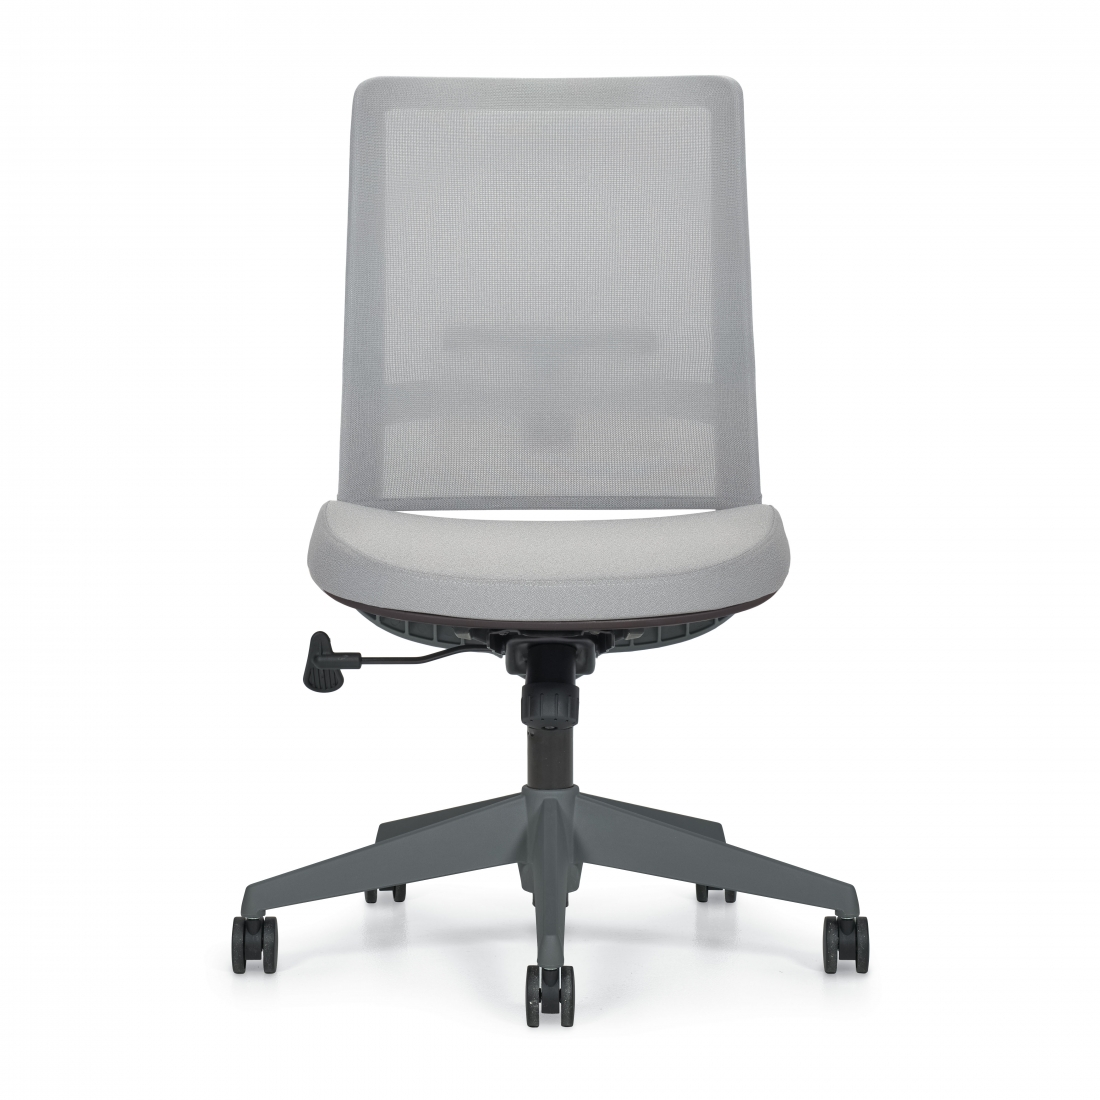 5541na model global factor armless mesh chair